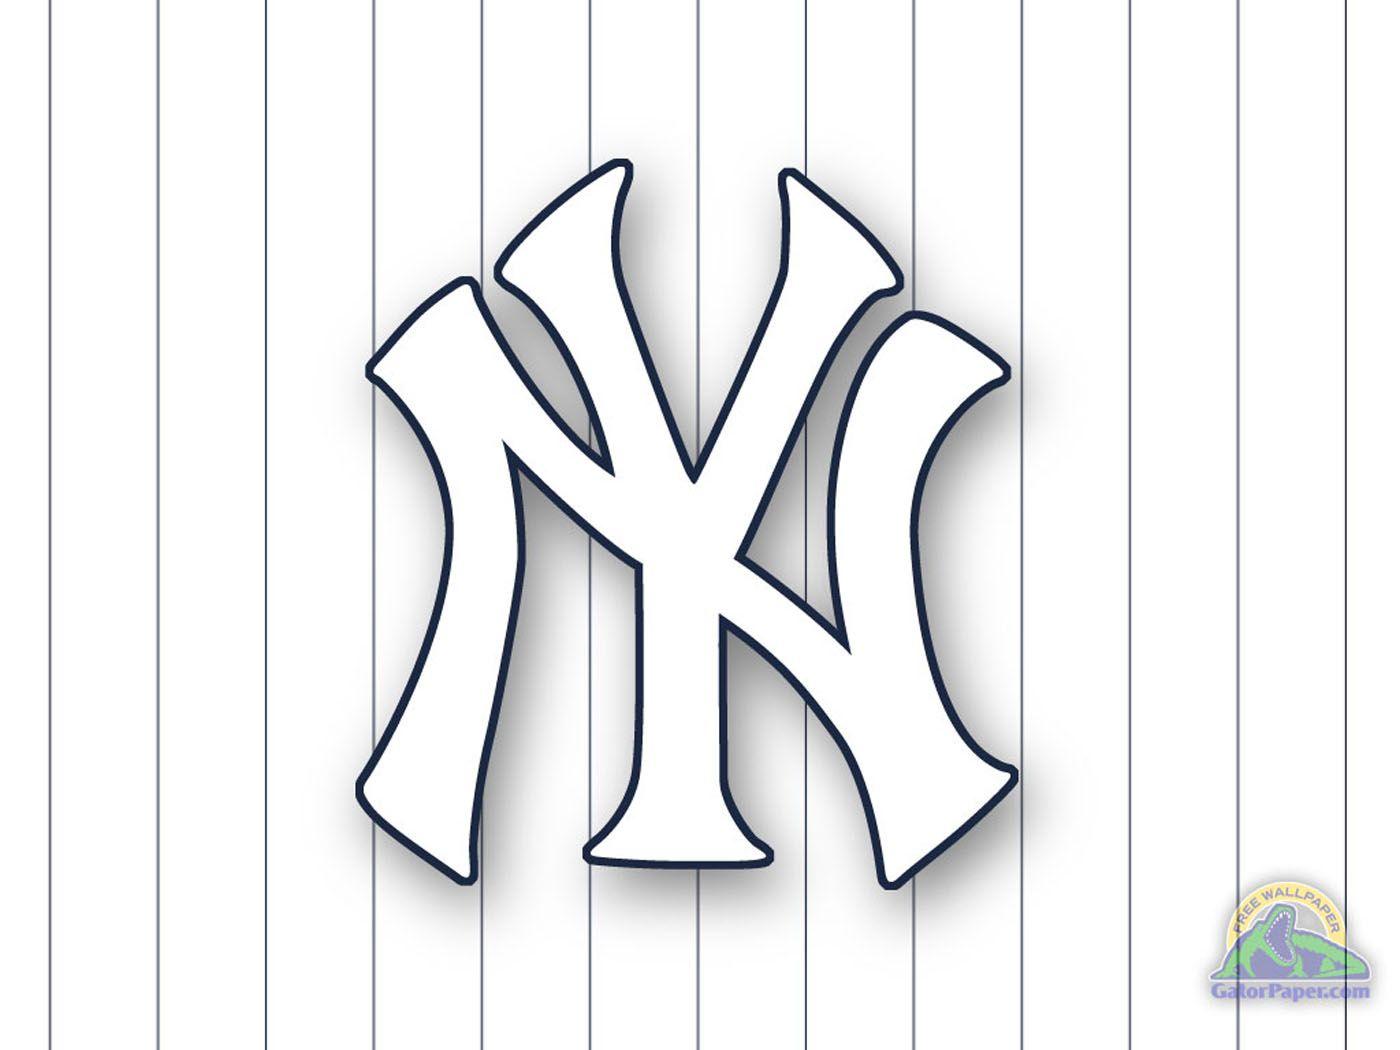 New York Yankees Wallpaper 53 Jpg 1400 1050 Coloring Pages Detailed Coloring Pages Christmas Coloring Pages